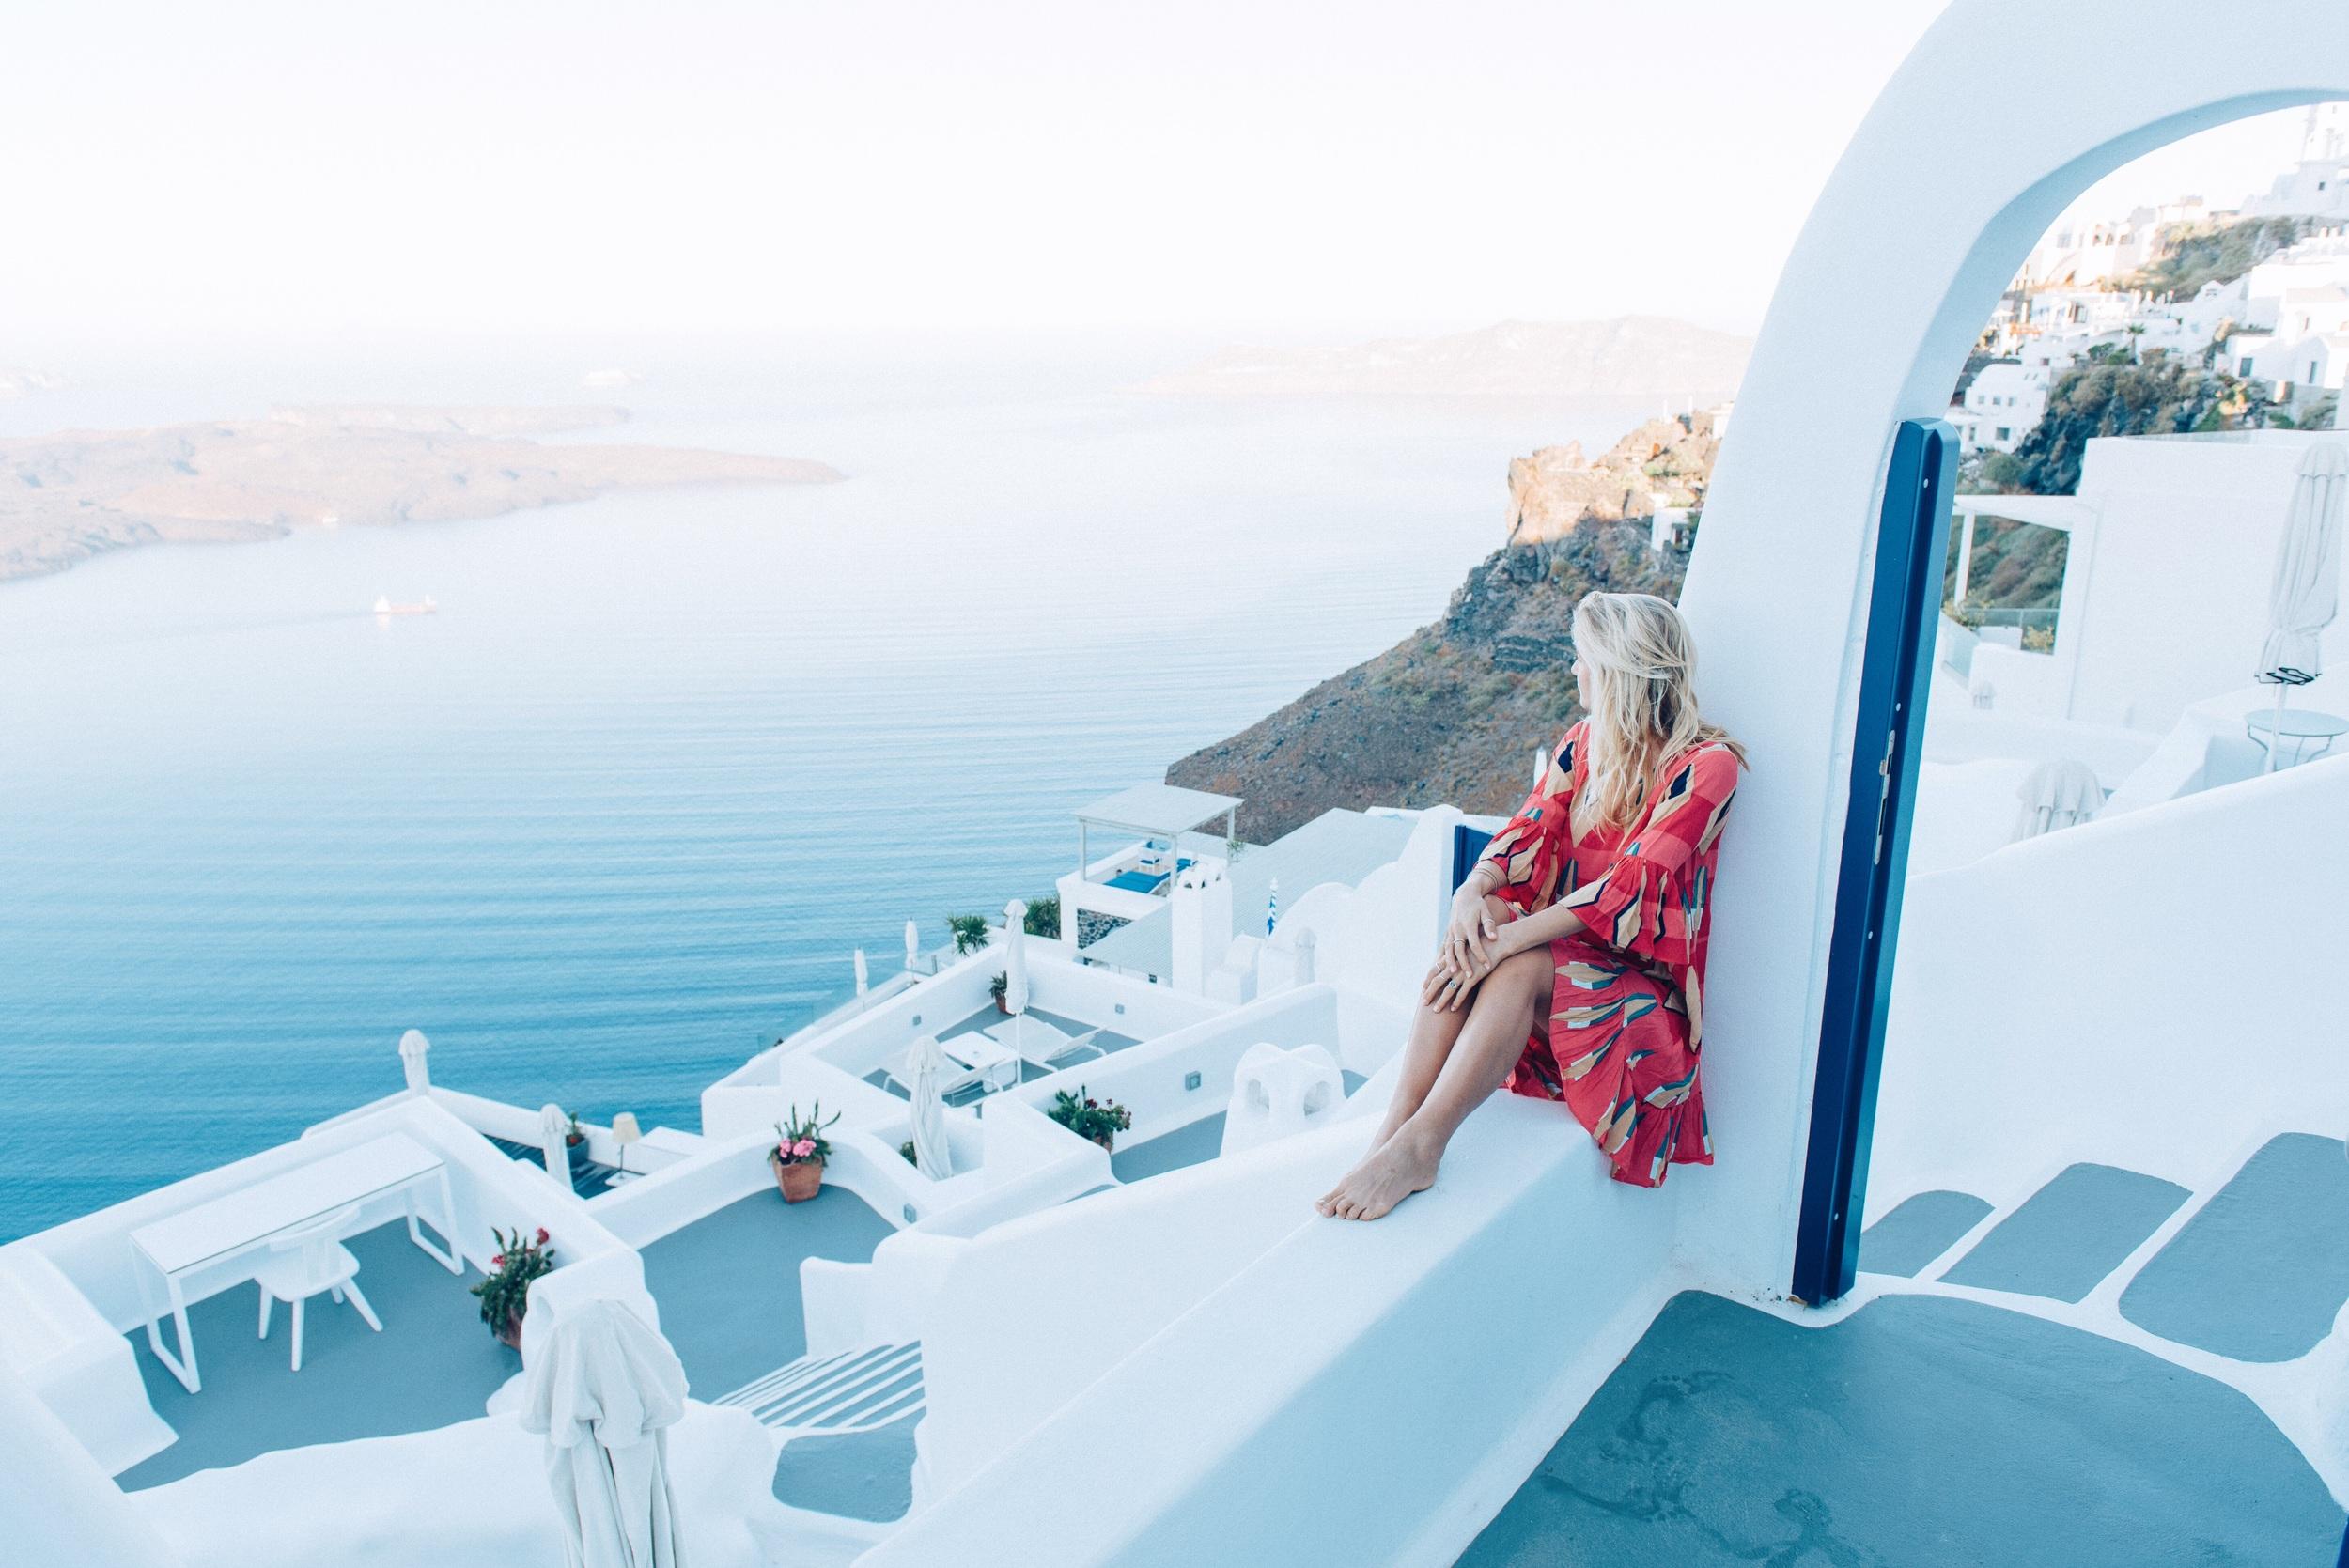 Chromata Hotel views